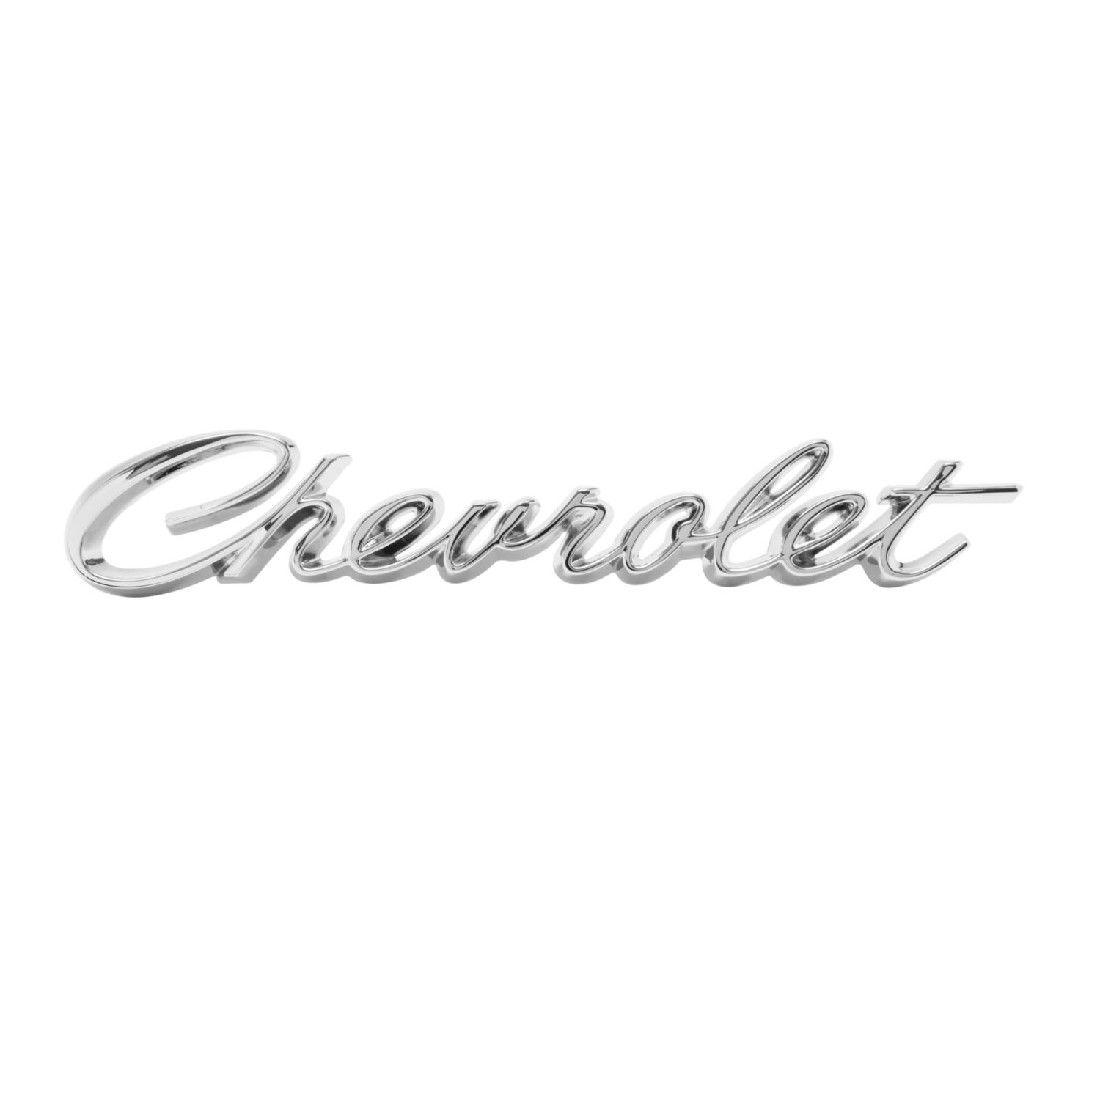 El Camino Chevrolet Tail Gate Emblem